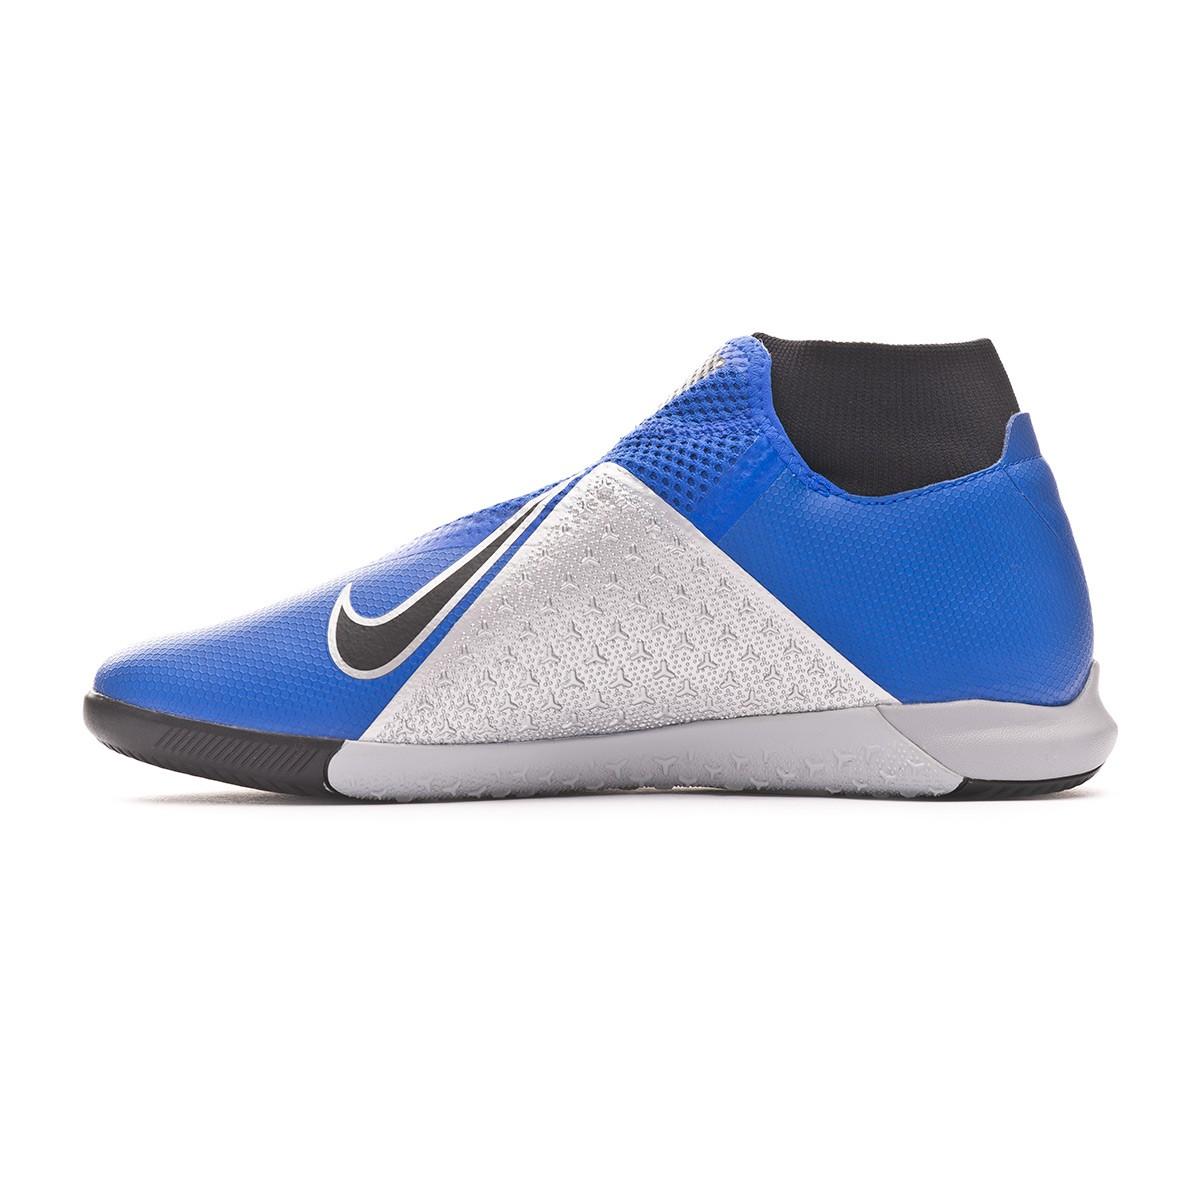 f01cd644854 Futsal Boot Nike Phantom Vision Academy DF IC Racer blue-Black - Football  store Fútbol Emotion